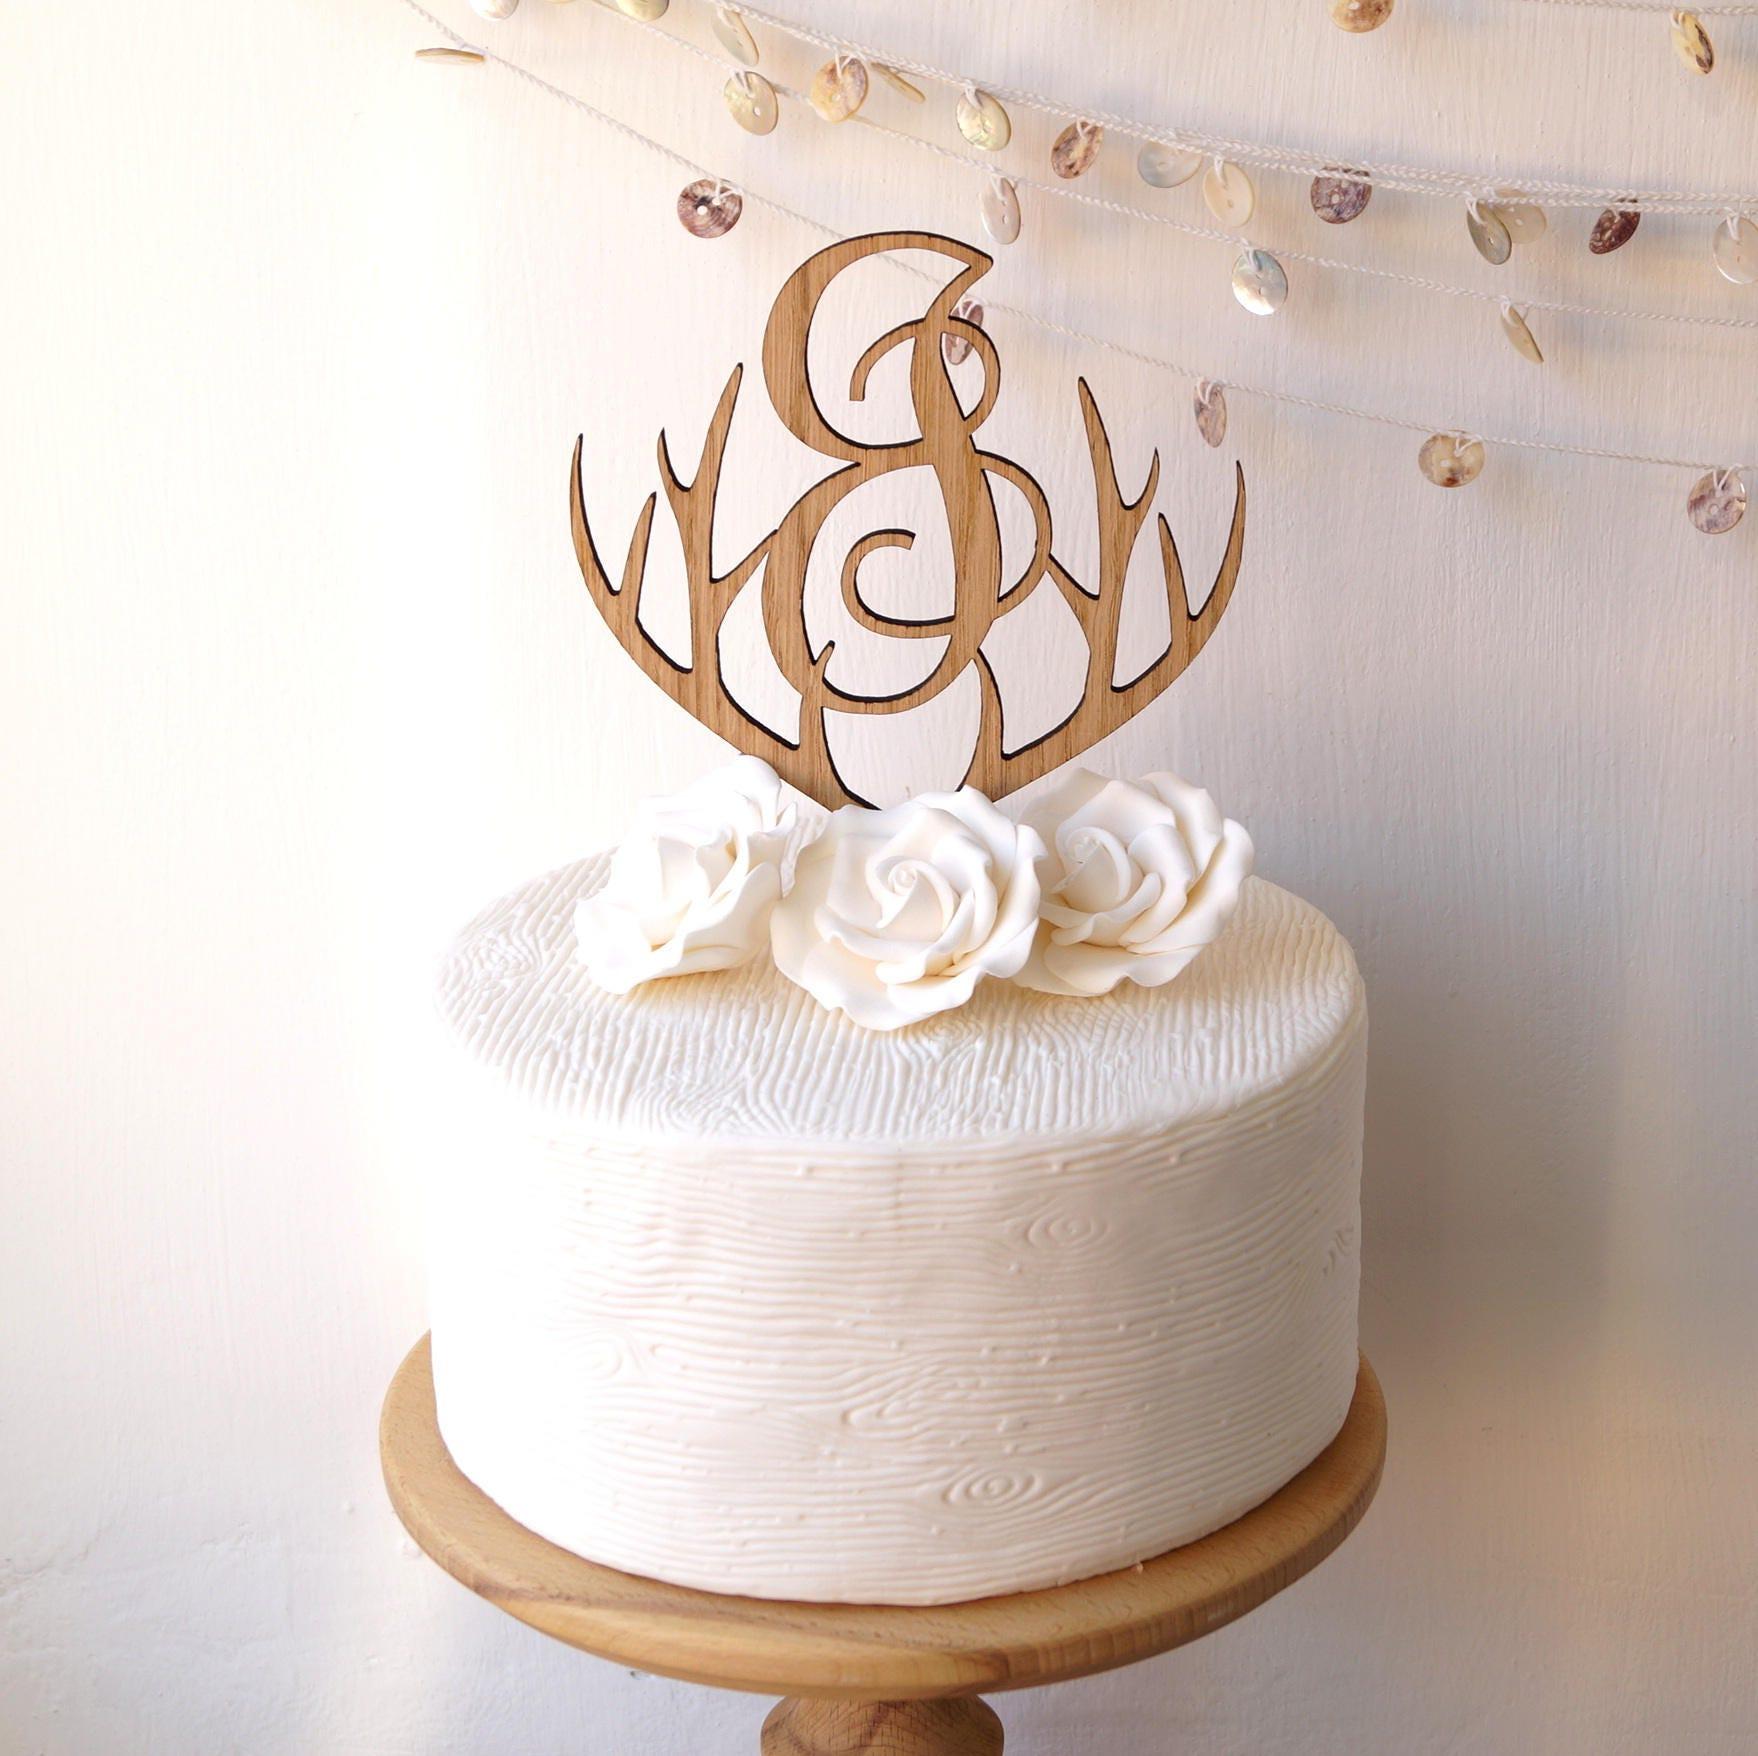 Monogram cake topper, wedding cake topper, antlers rustic wooden ...